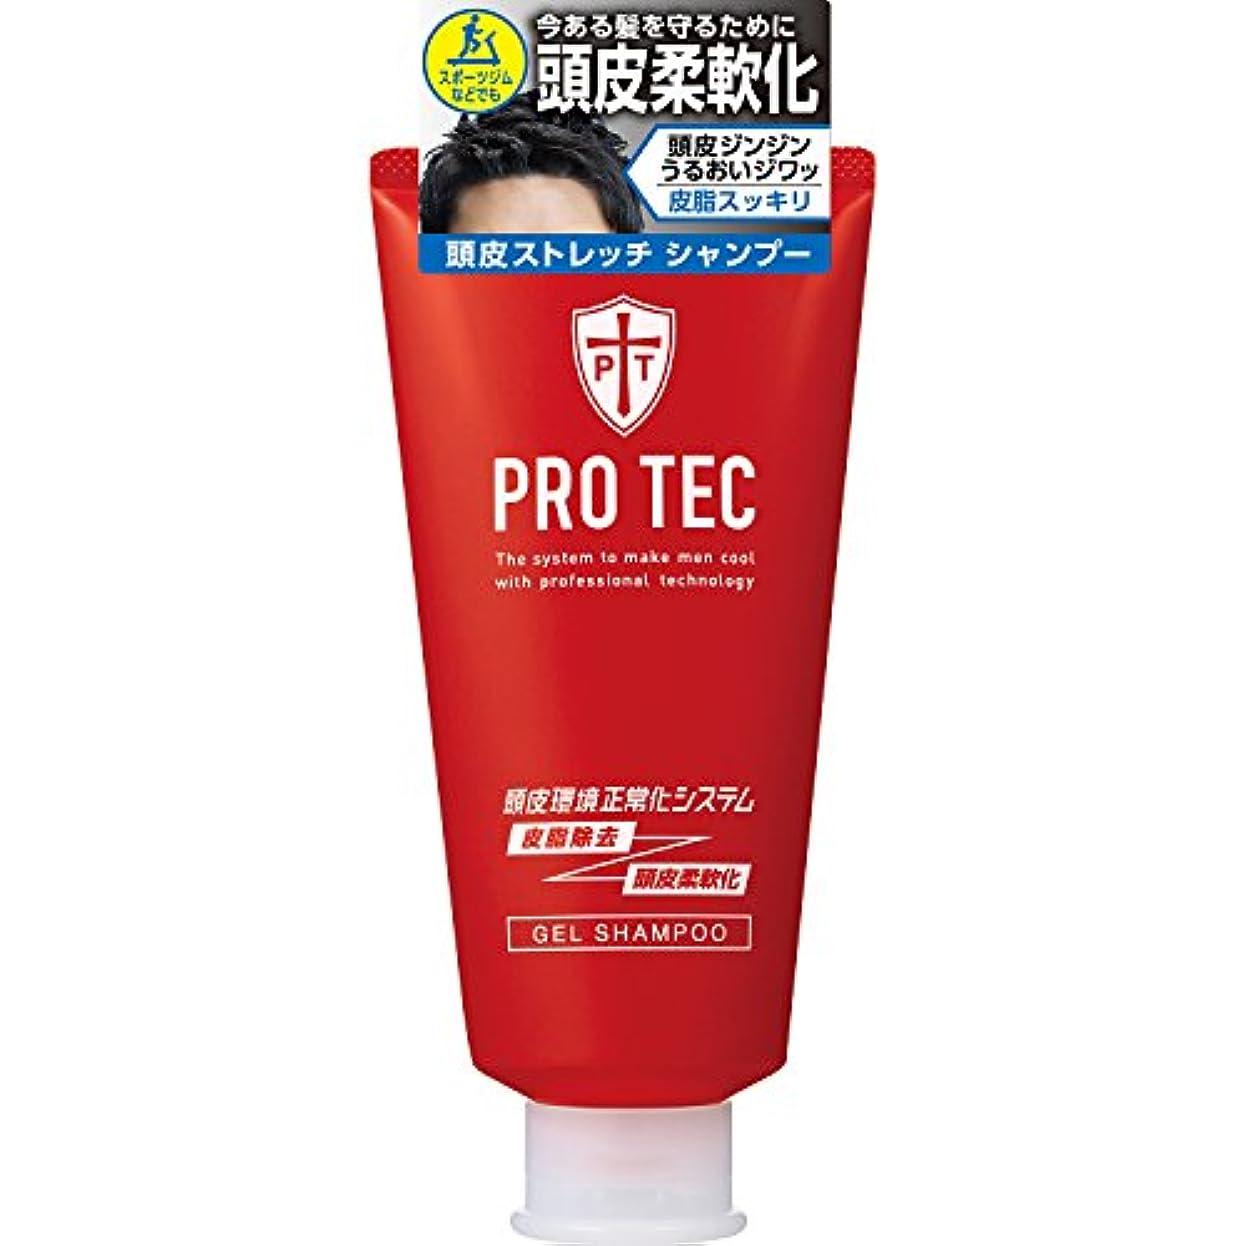 PRO TEC(プロテク) 頭皮ストレッチ シャンプー チューブ 150g(医薬部外品)